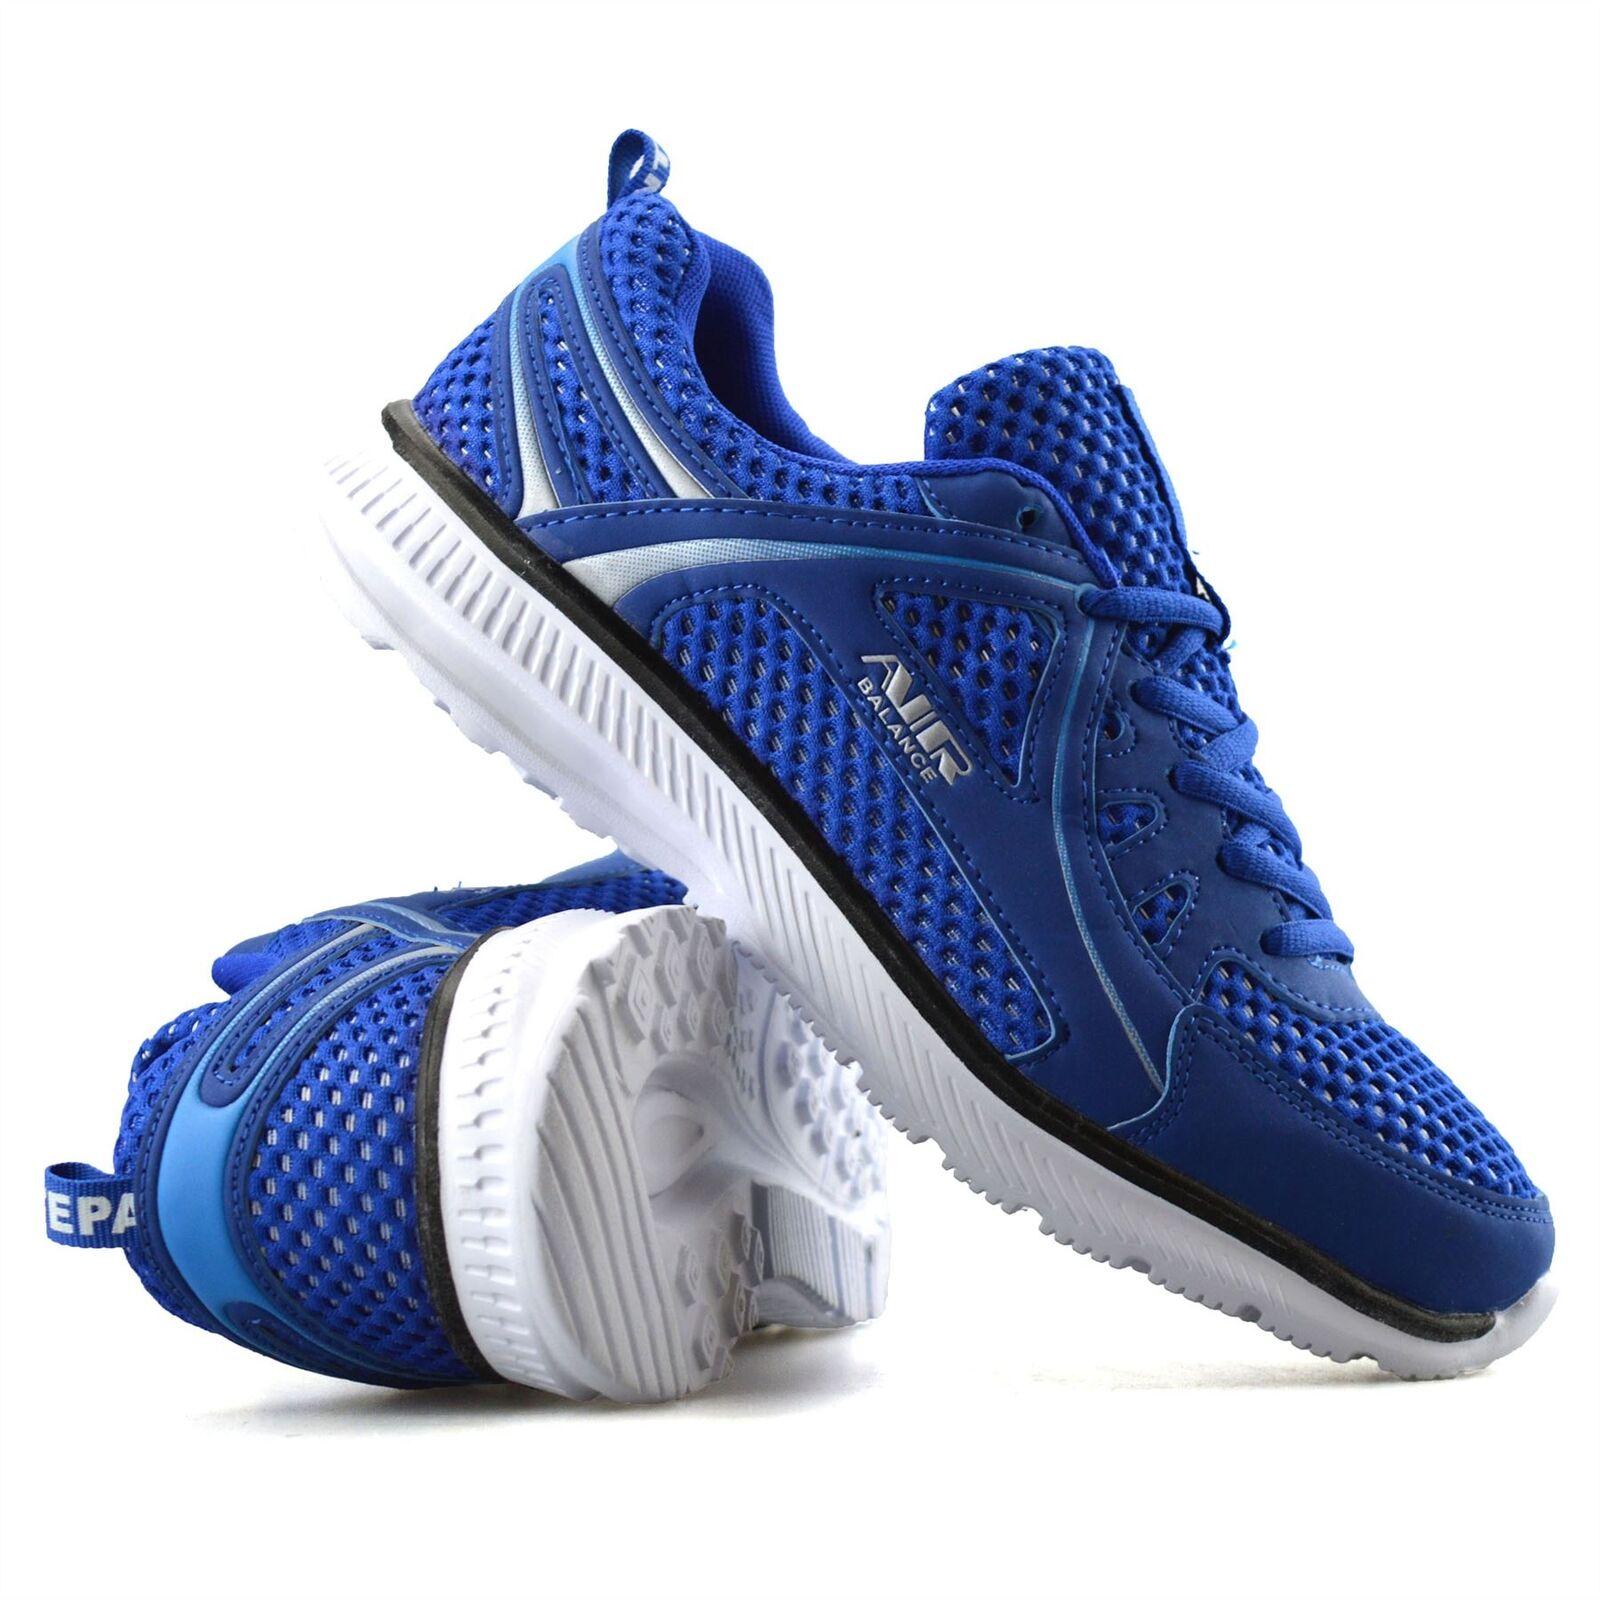 Hommes Casual Running Marche Gym Sport Antichoc Dentelle Baskets Chaussures Taille